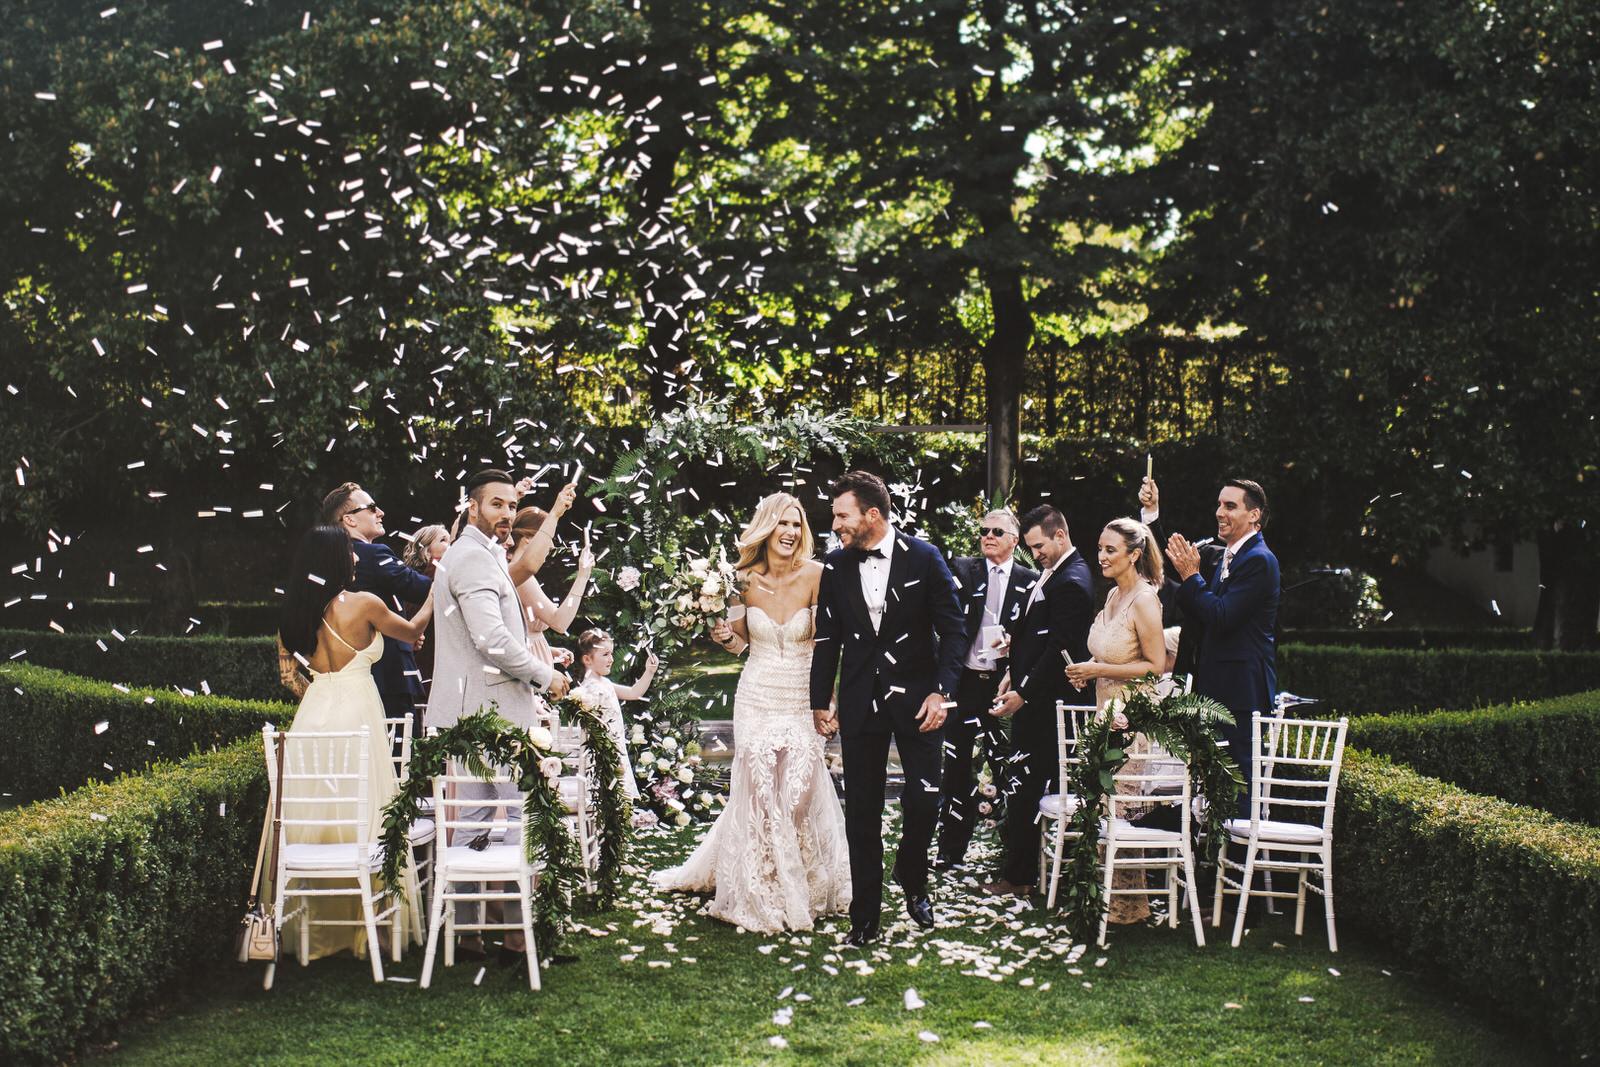 wedding photographer in italy-venice-tuscany-florence-amalfi coast-como lake-villa del balbianello-siena-amalfi-ravello-belmond-villa cimbrone49